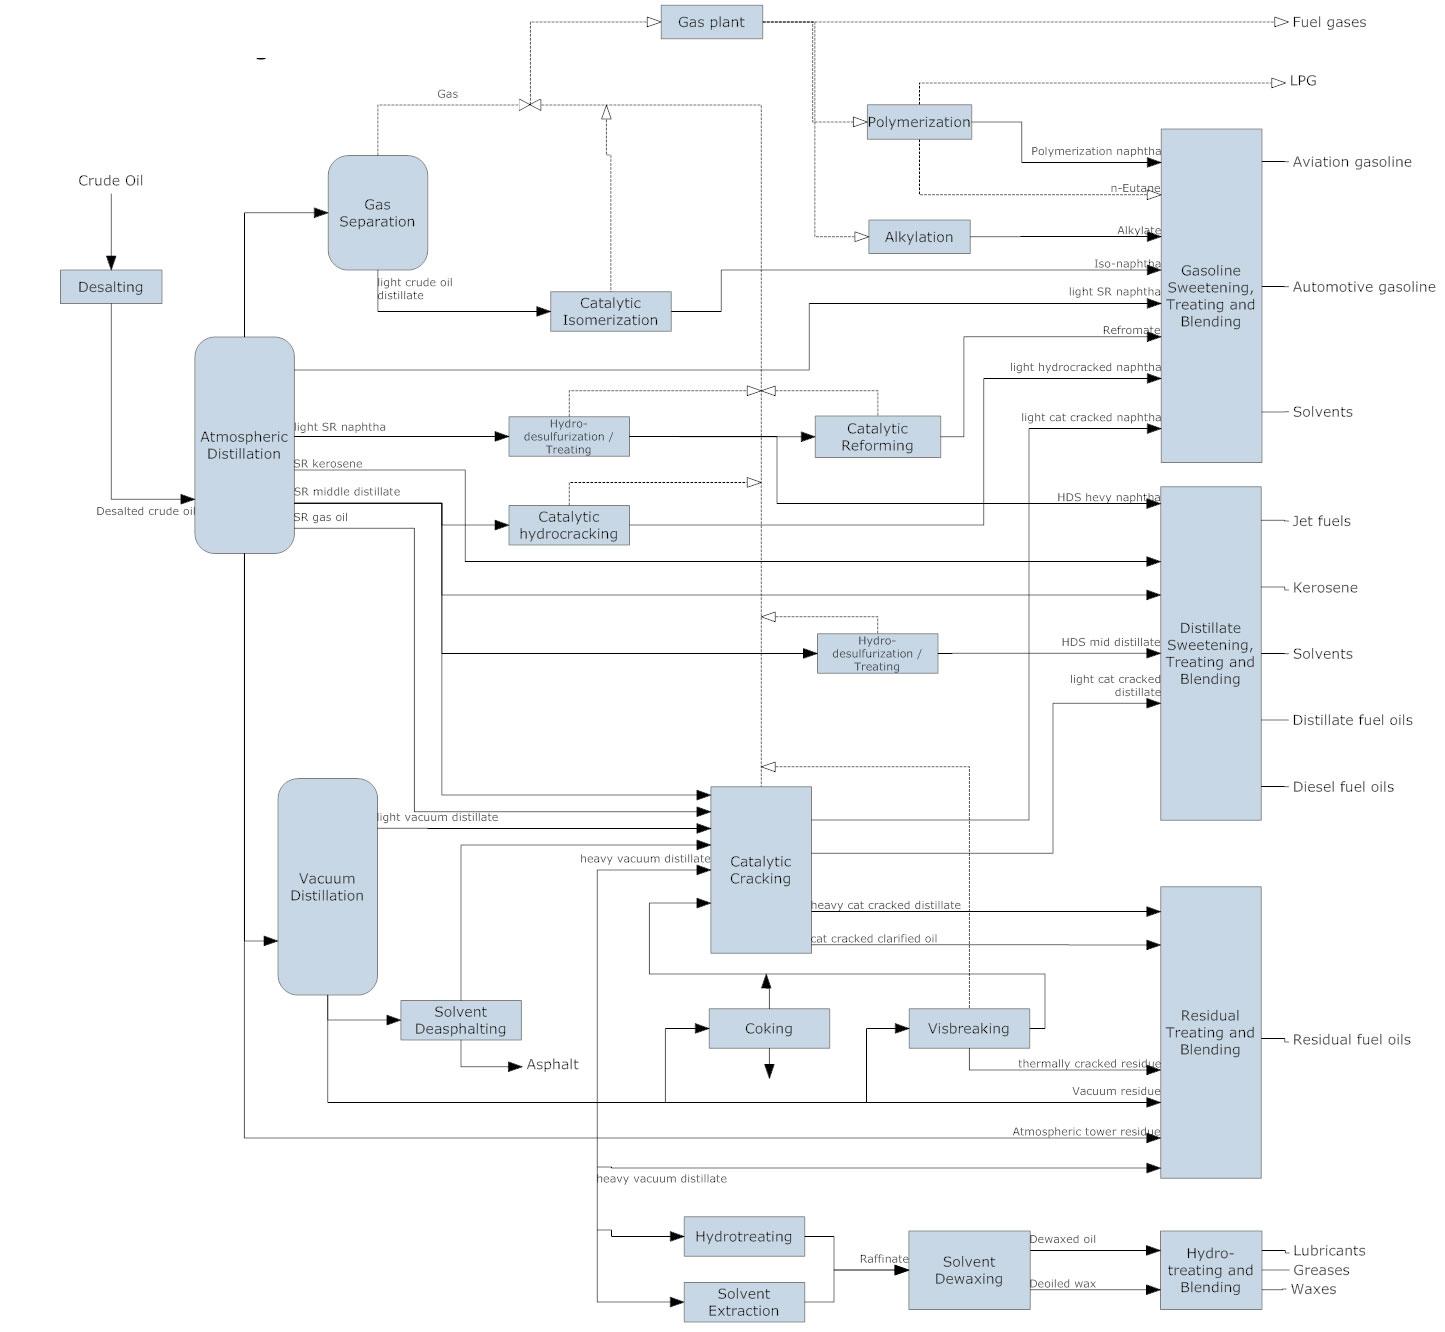 process flow diagram example pertroleum refining process?bn=1510011142 flowchart types and flowchart uses